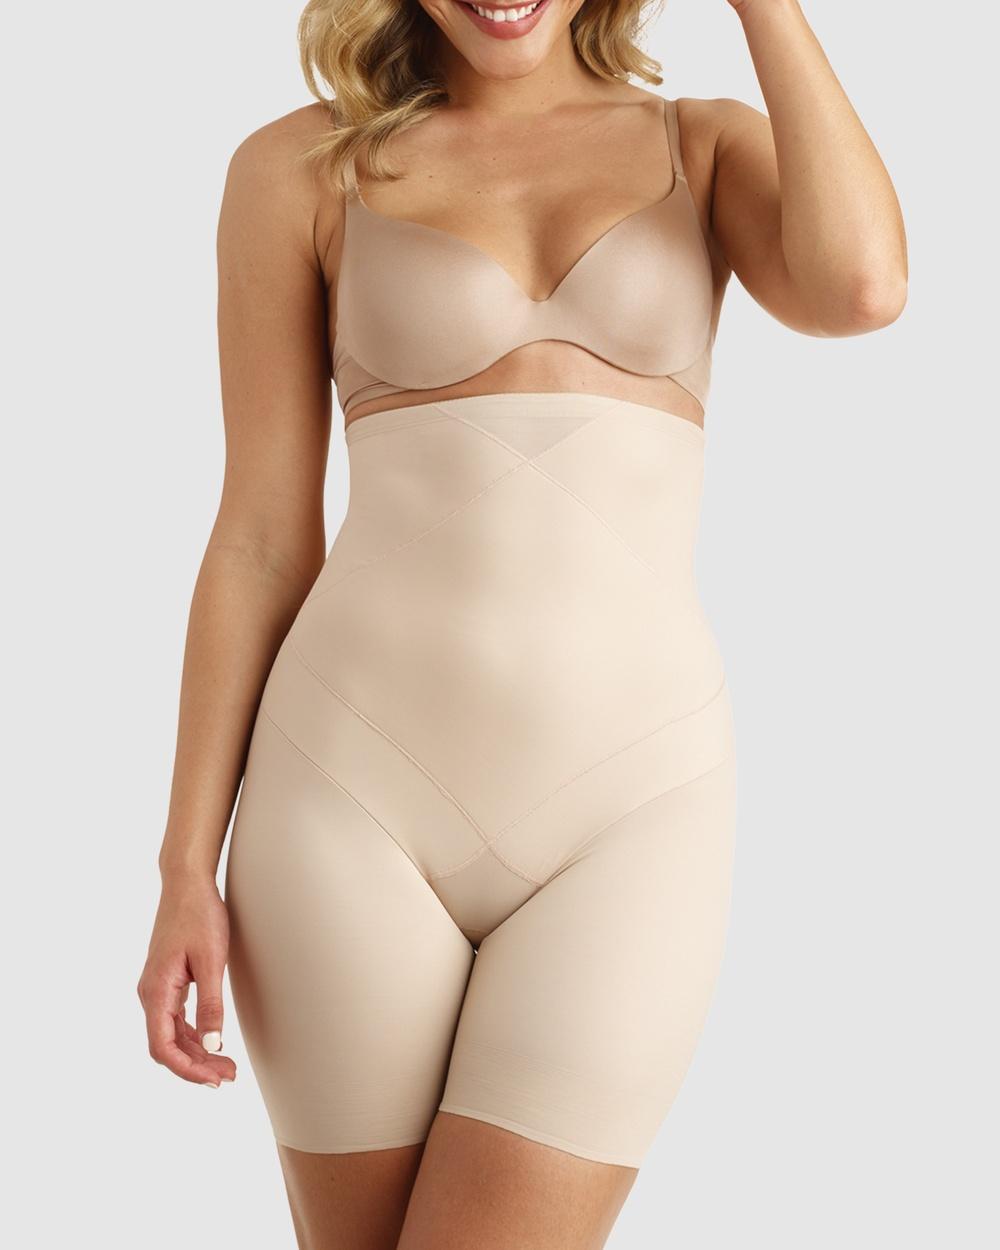 Miraclesuit Shapewear Tummy Tuck High Waist Thigh Slimmer Briefs Nude High-Waist